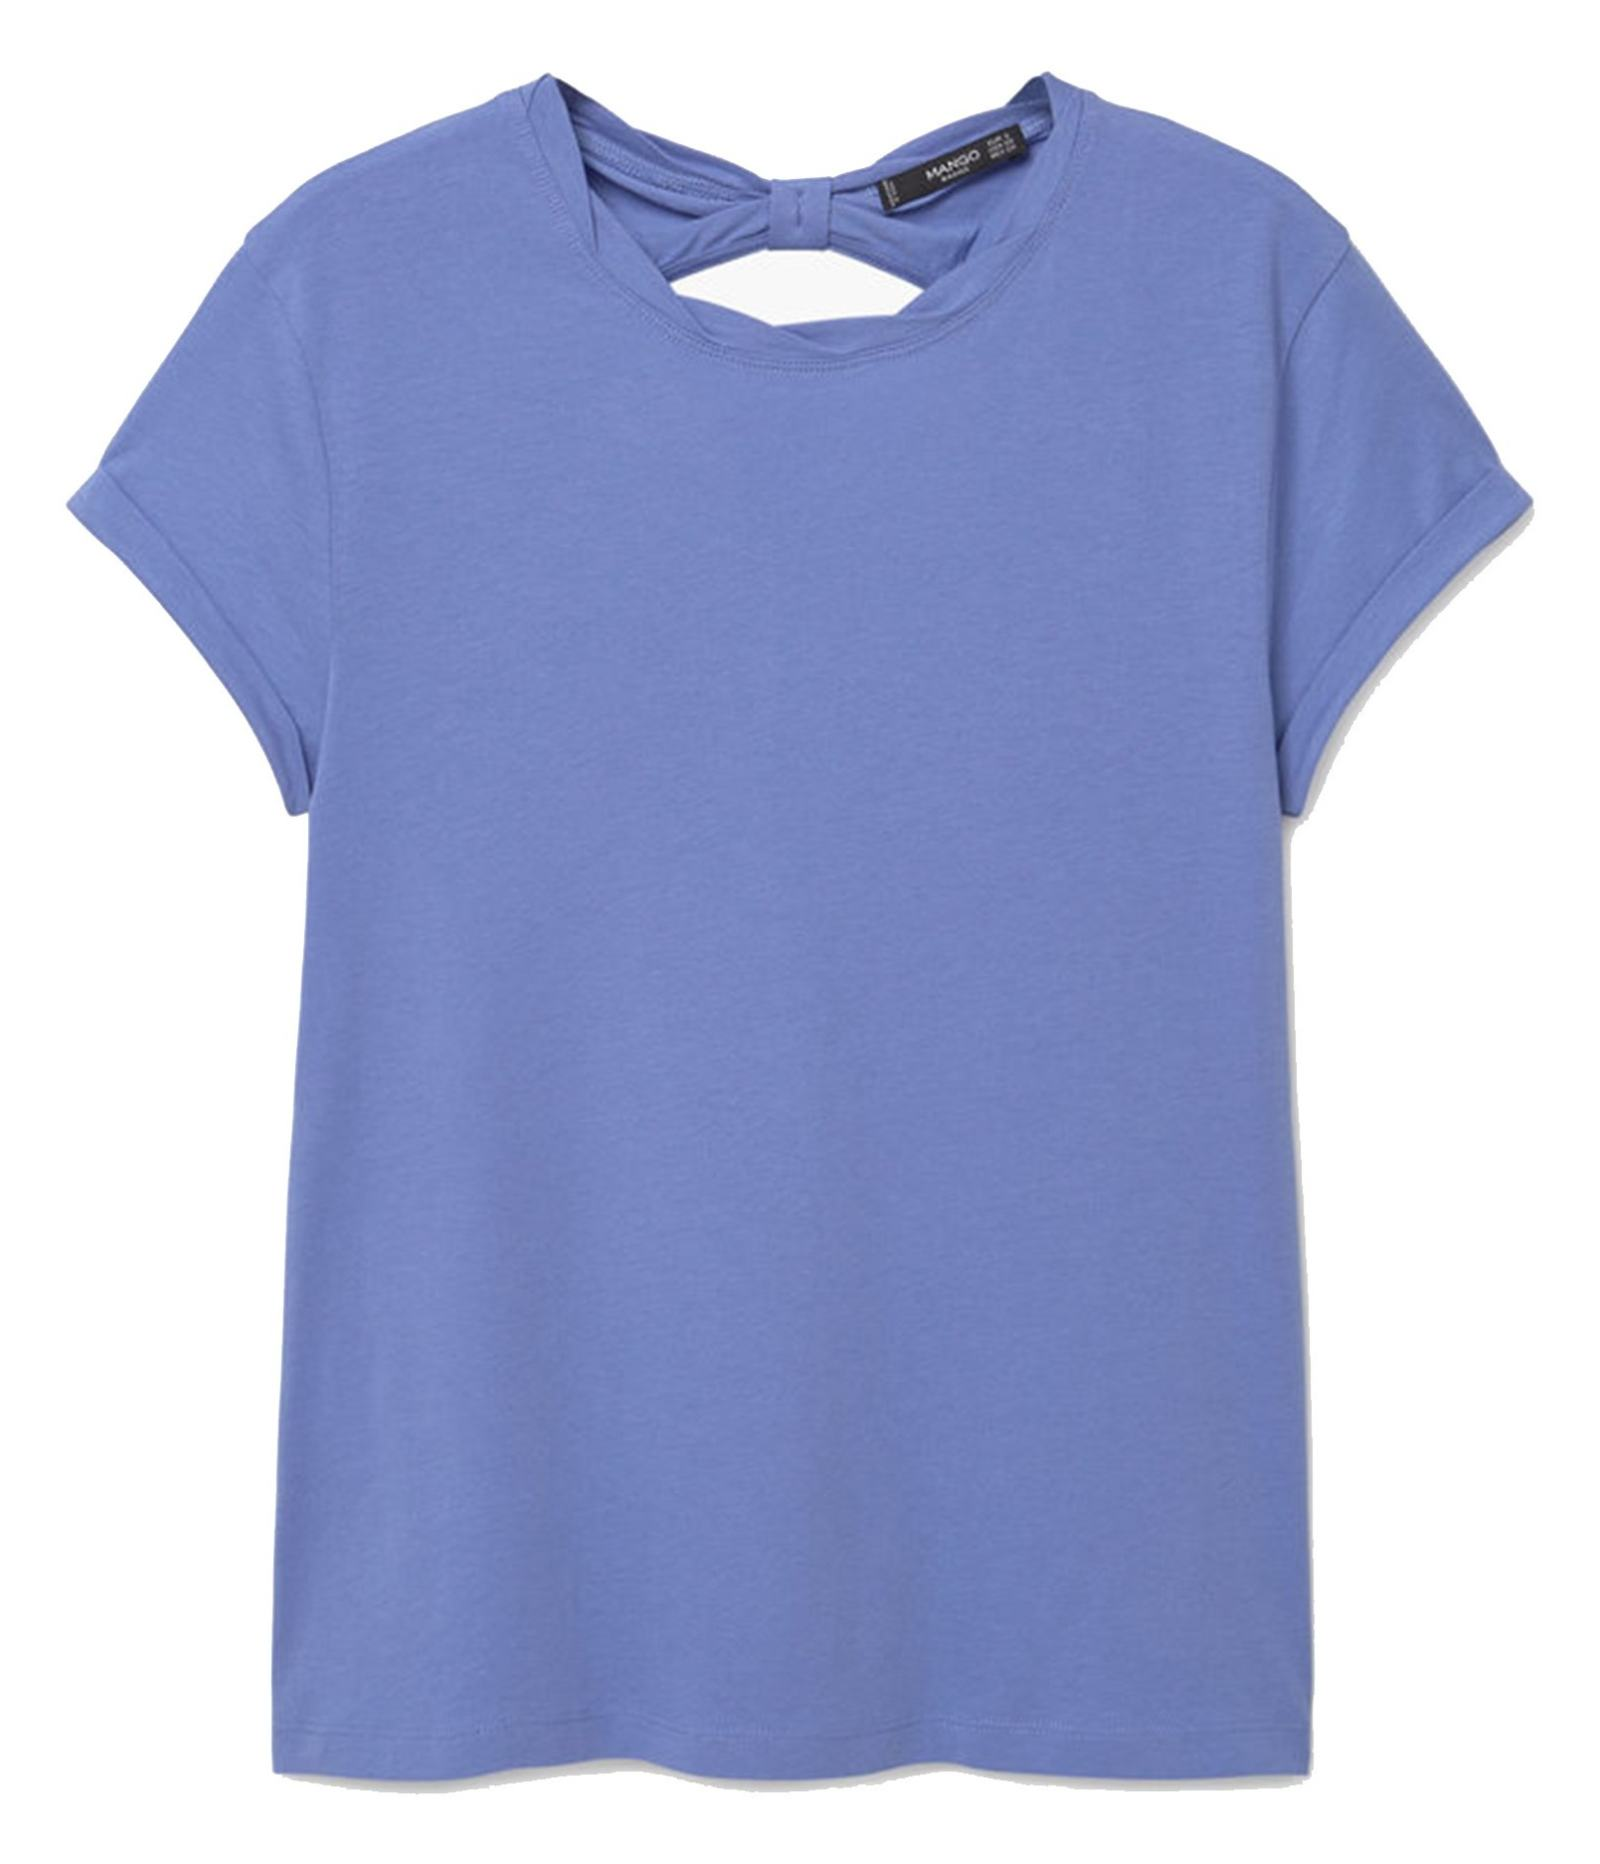 تی شرت نخی زنانه - مانگو - آبي - 1